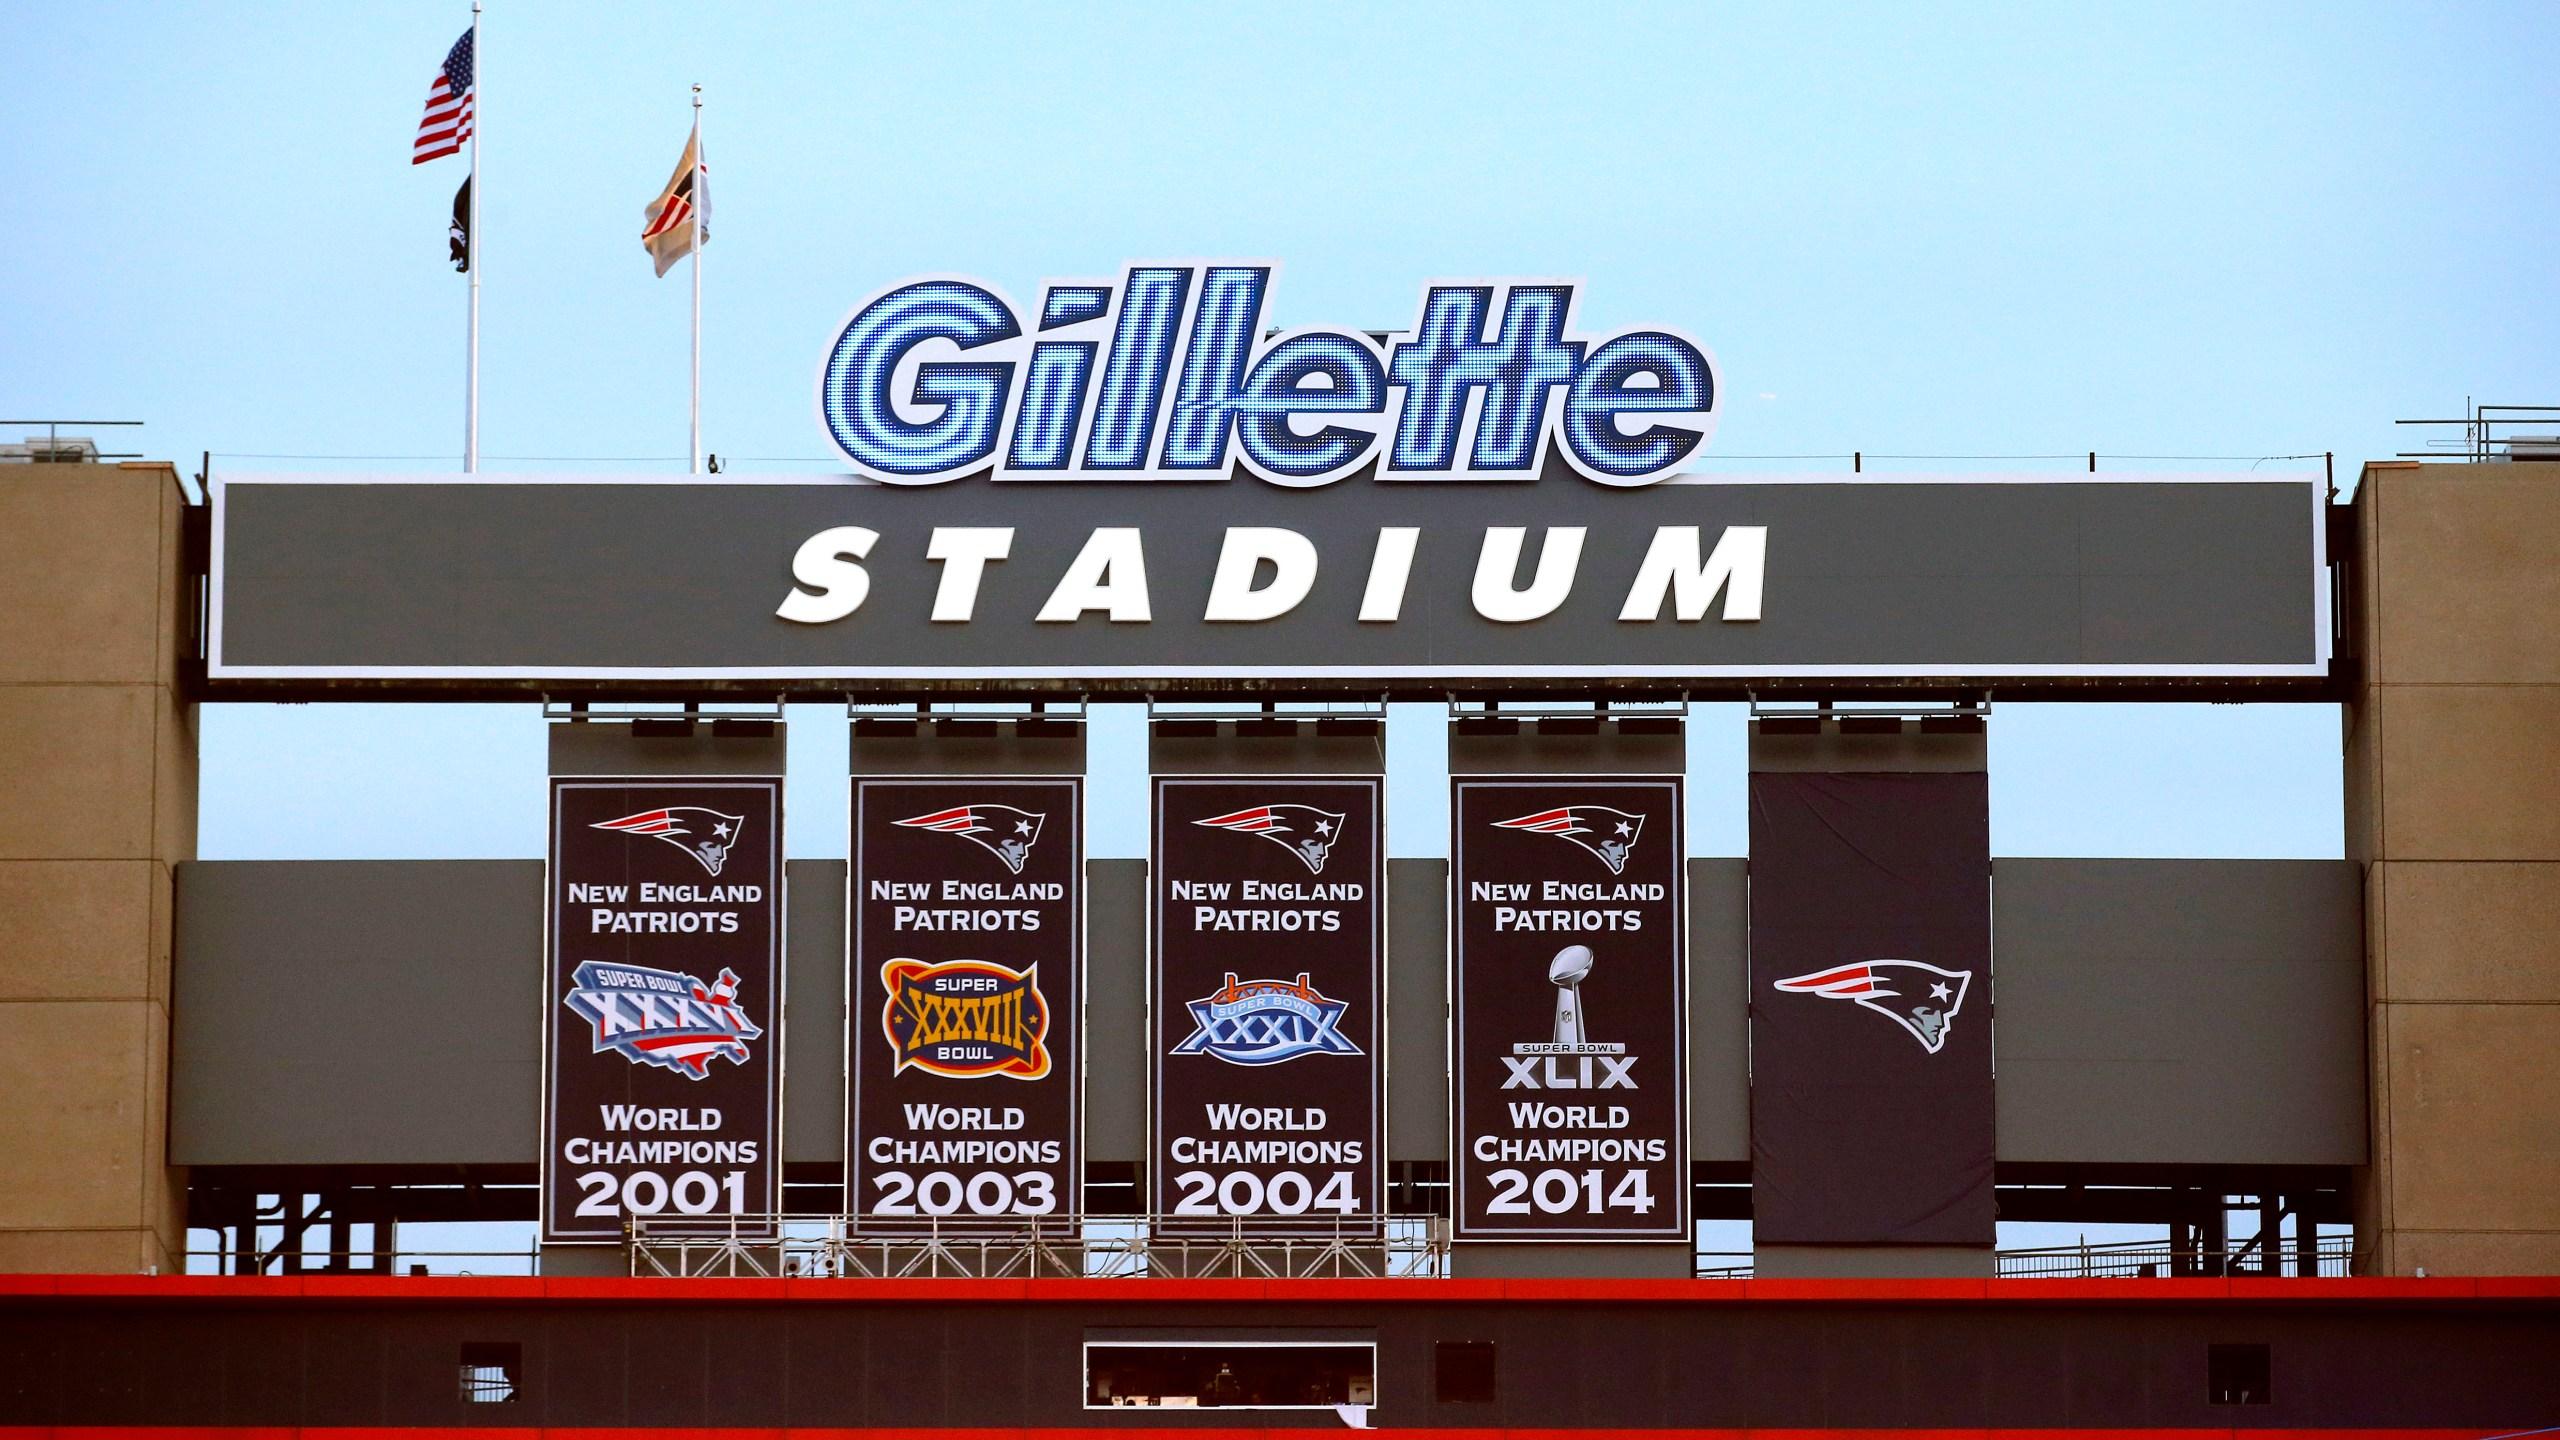 Giants Patriots Football_546968